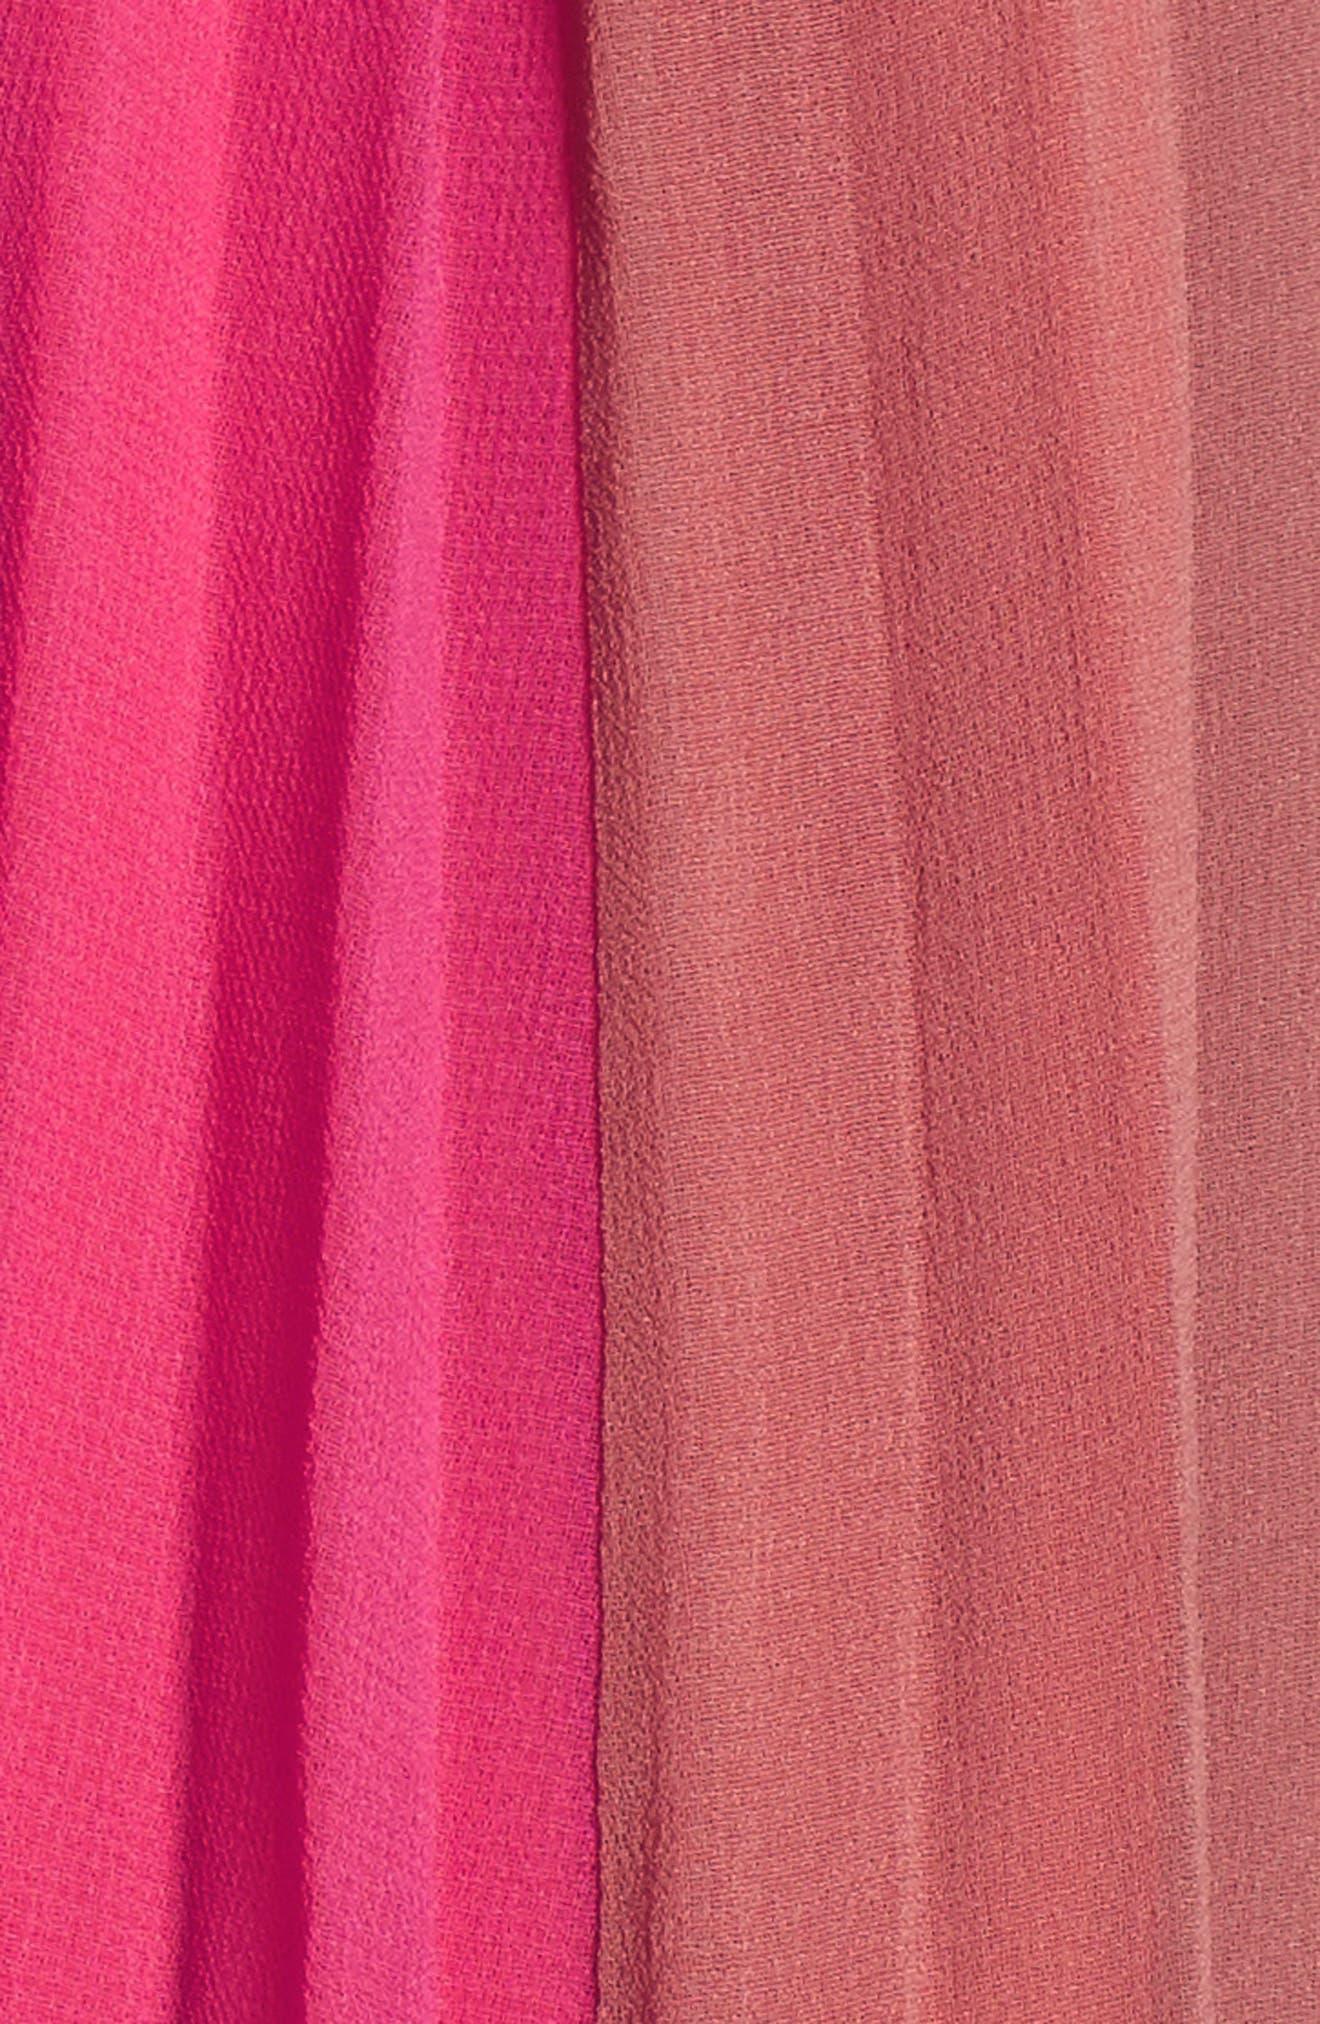 Pepper Pleated Dress,                             Alternate thumbnail 6, color,                             600